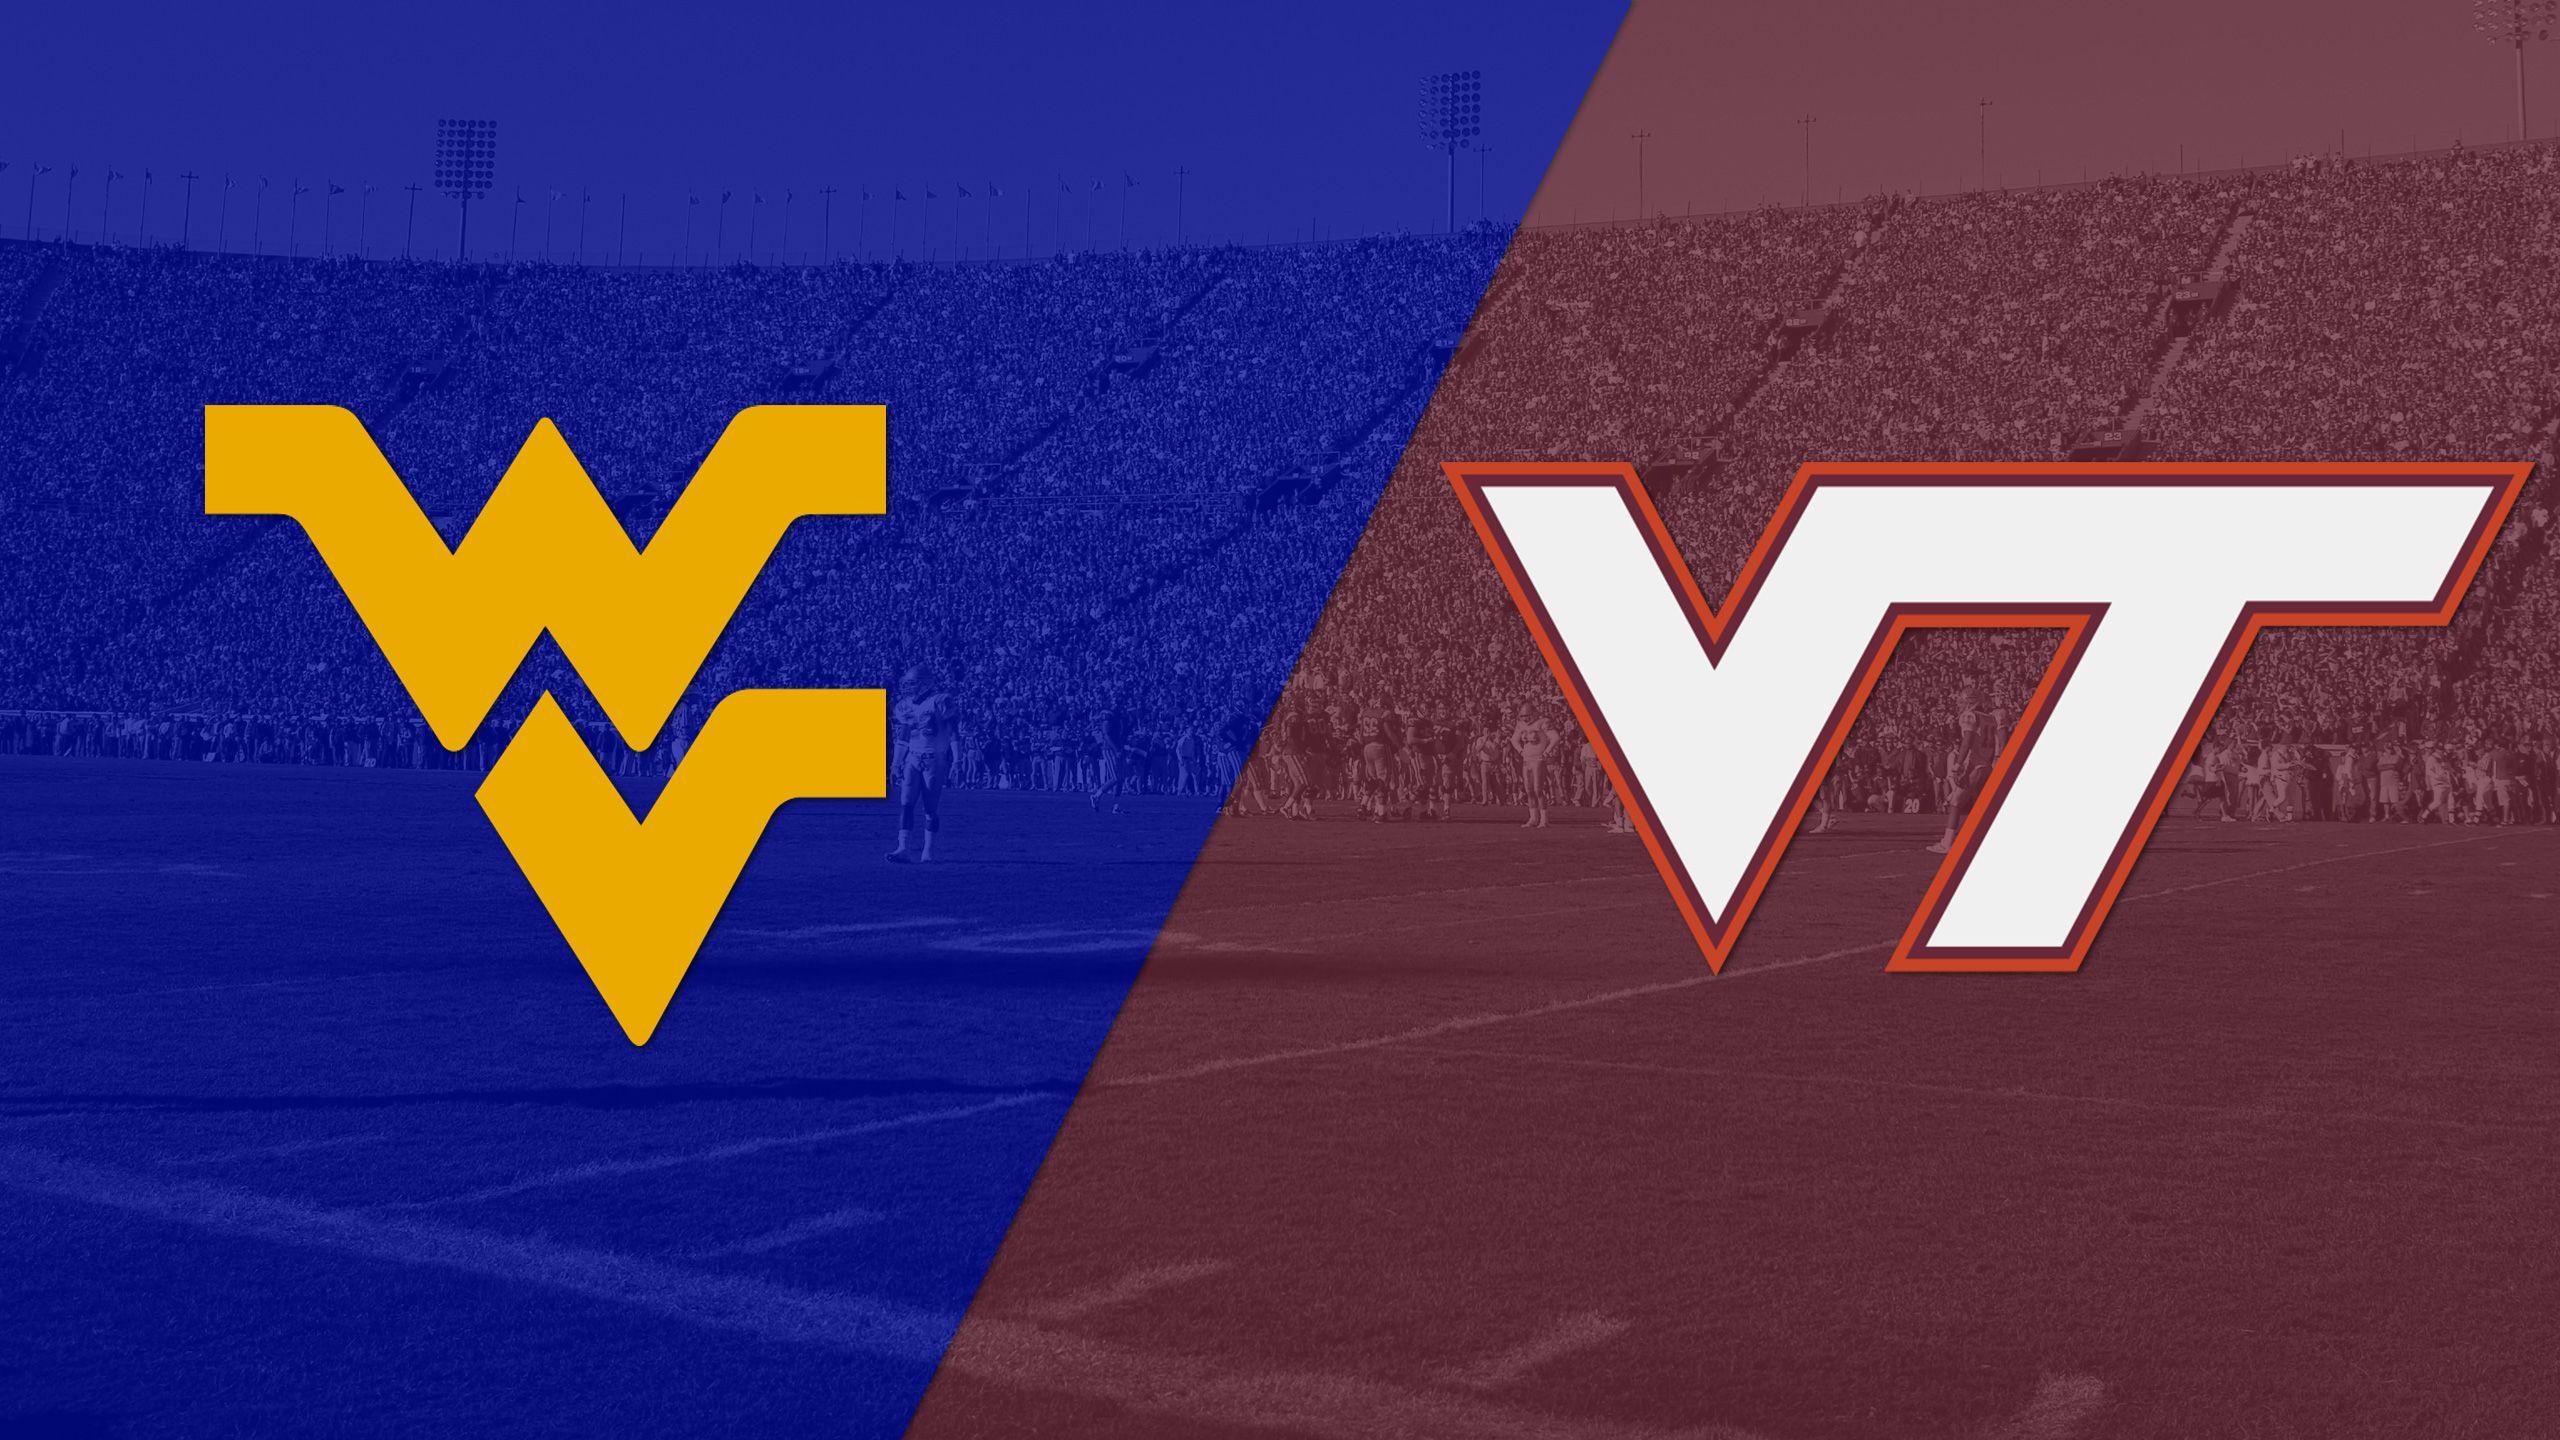 #22 West Virginia vs. #21 Virginia Tech (Football)